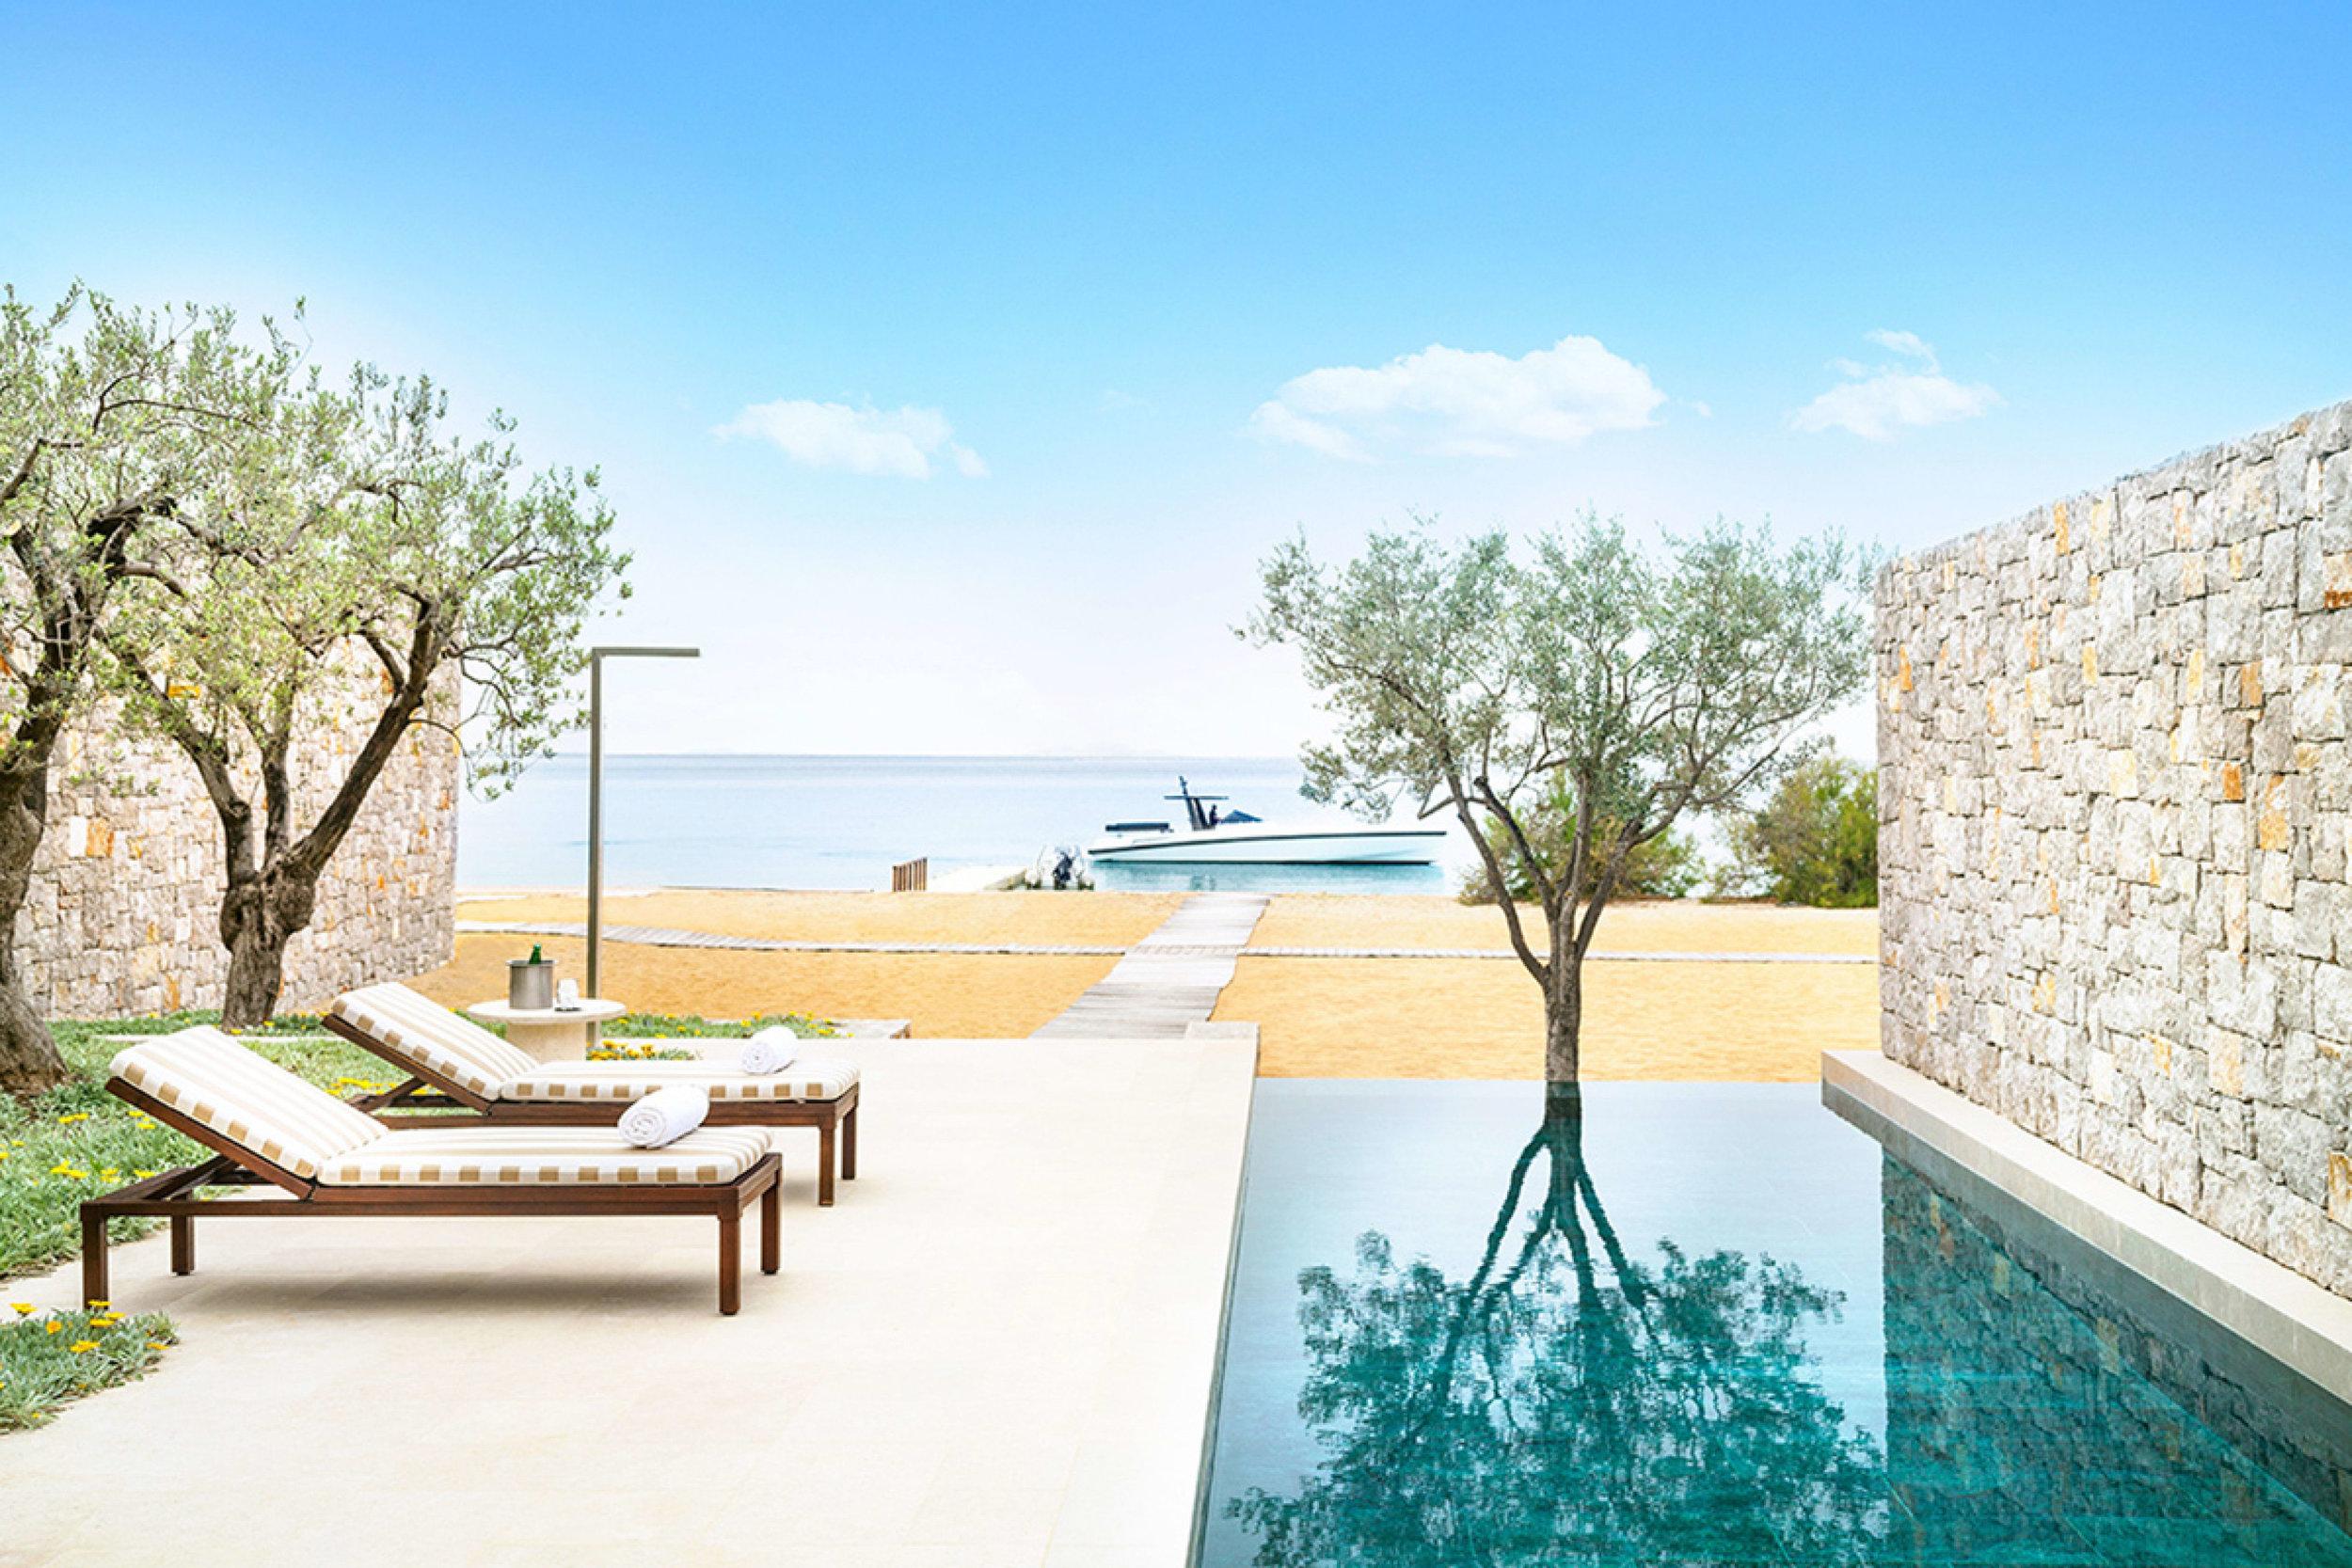 amanzoe-beach-cabana-2-1200x800.jpg